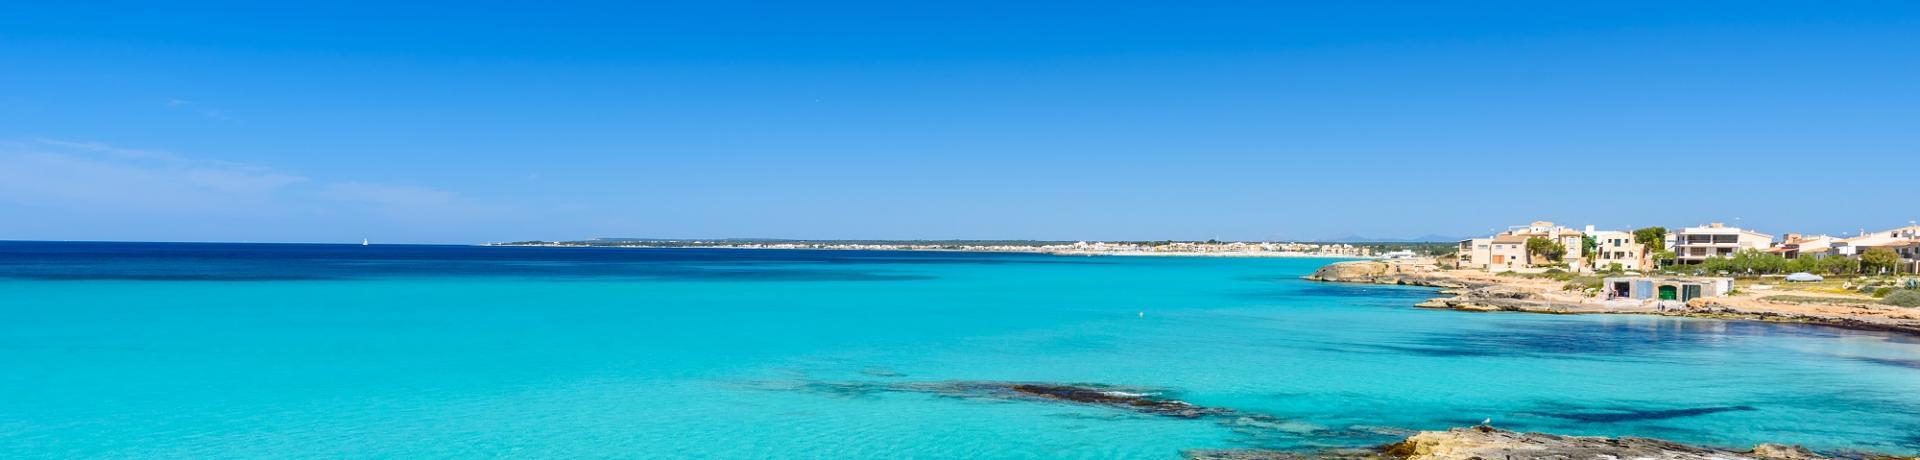 Spanien: Mallorca - Es Trenc Strand Emotion